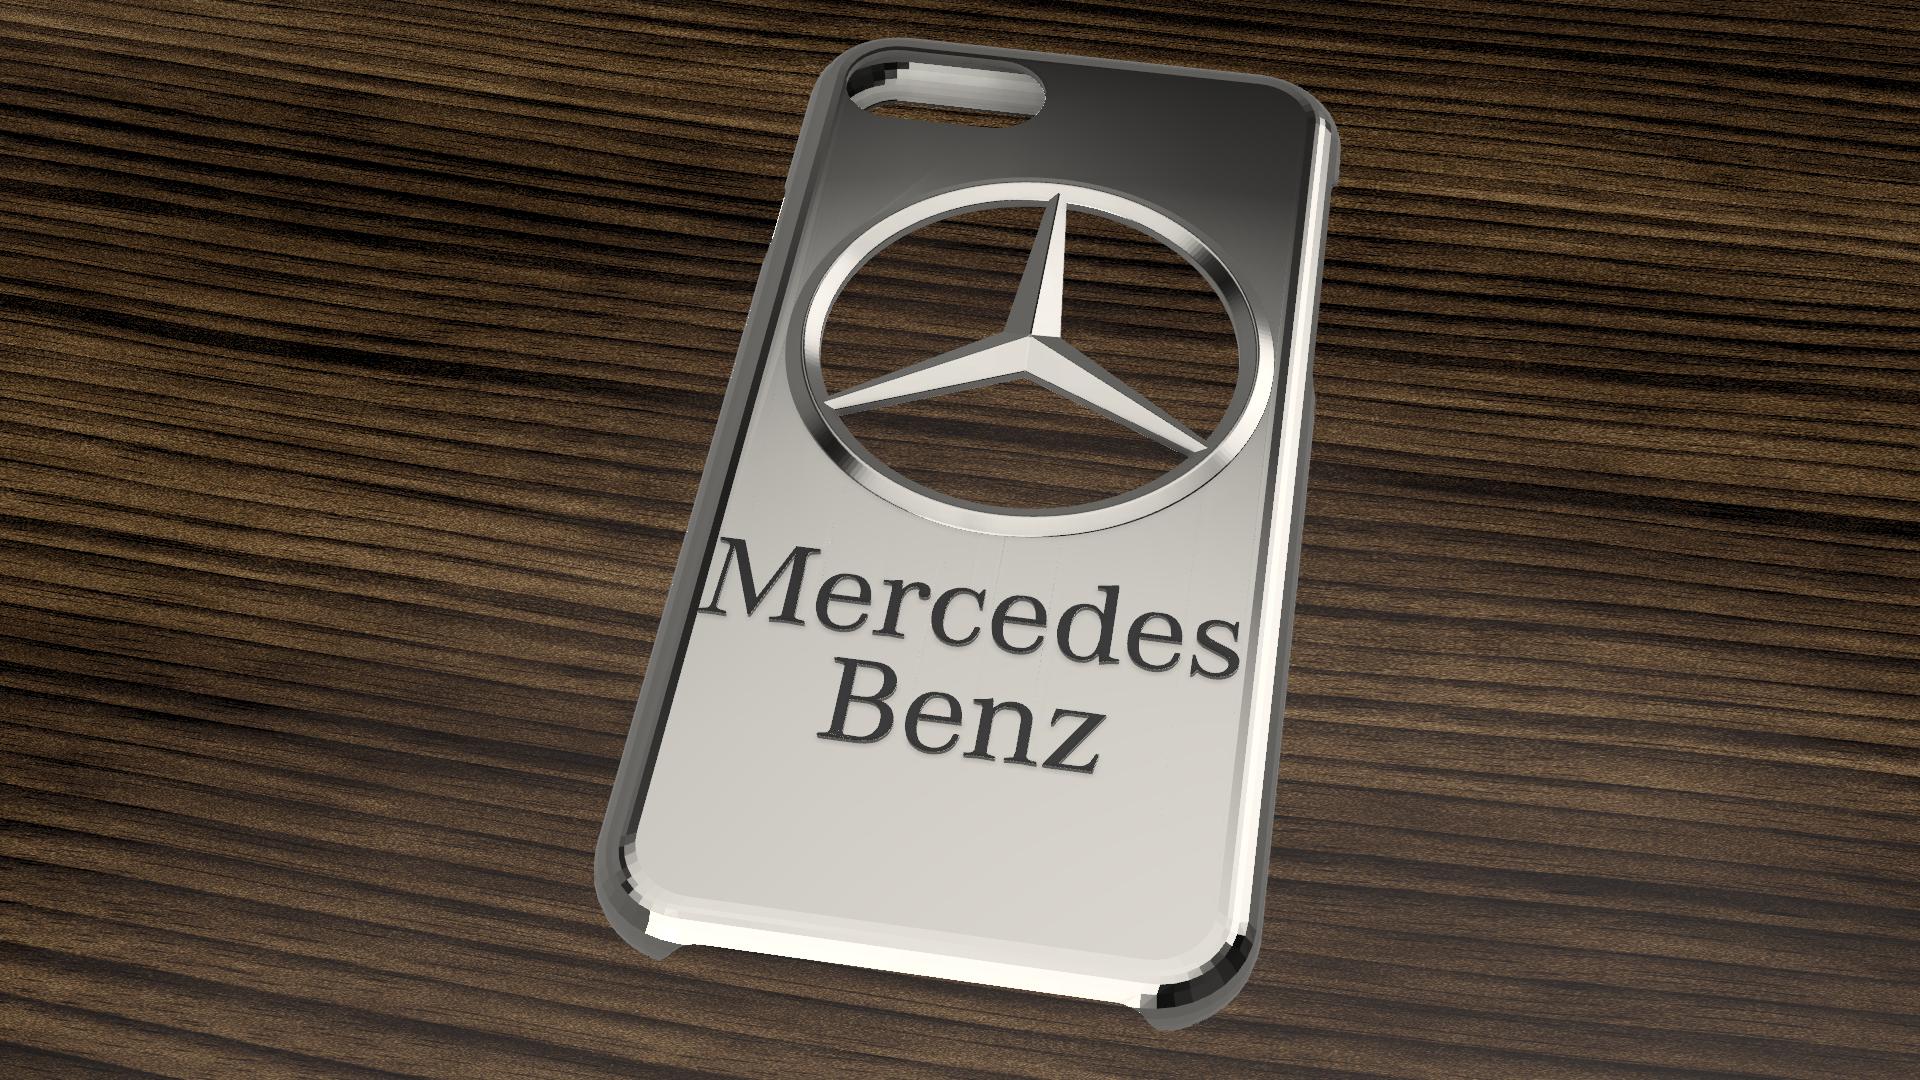 Case Iphone 78 Mercedes Benz